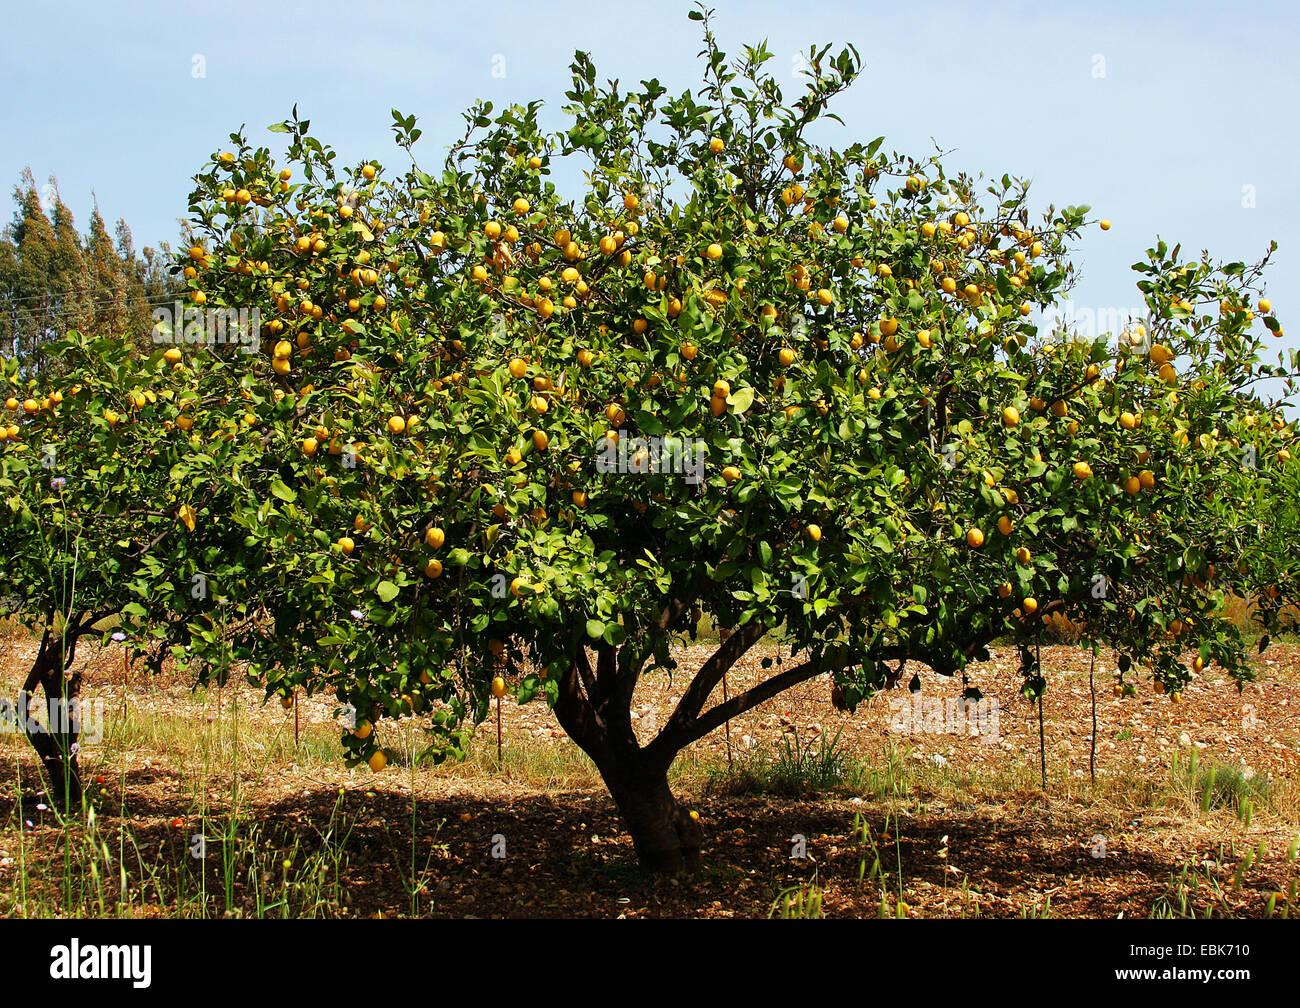 Lemon tree citrus limon tree with fruits stock photo for Lemon plant images